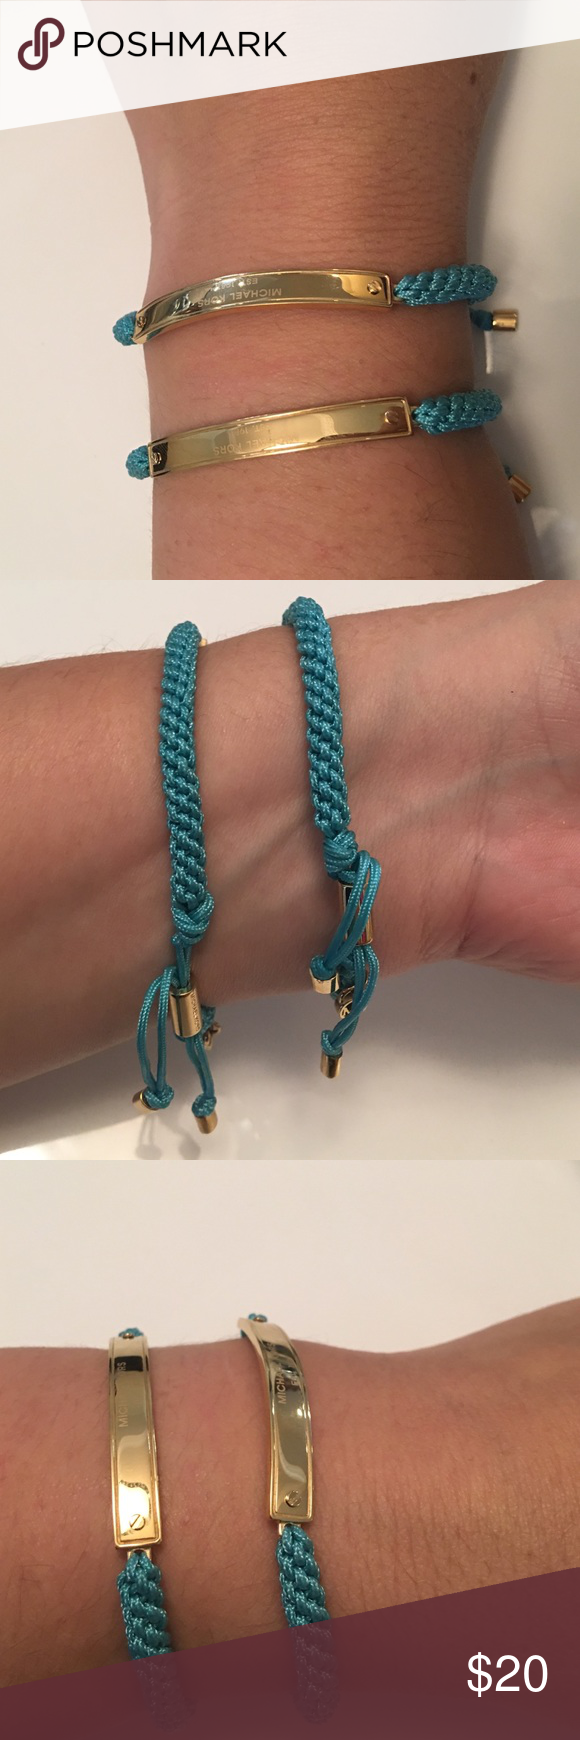 Michael Kors bracelet in turquoise Michael Kors turquoise bracelet. No trades. Michael Kors Jewelry Bracelets